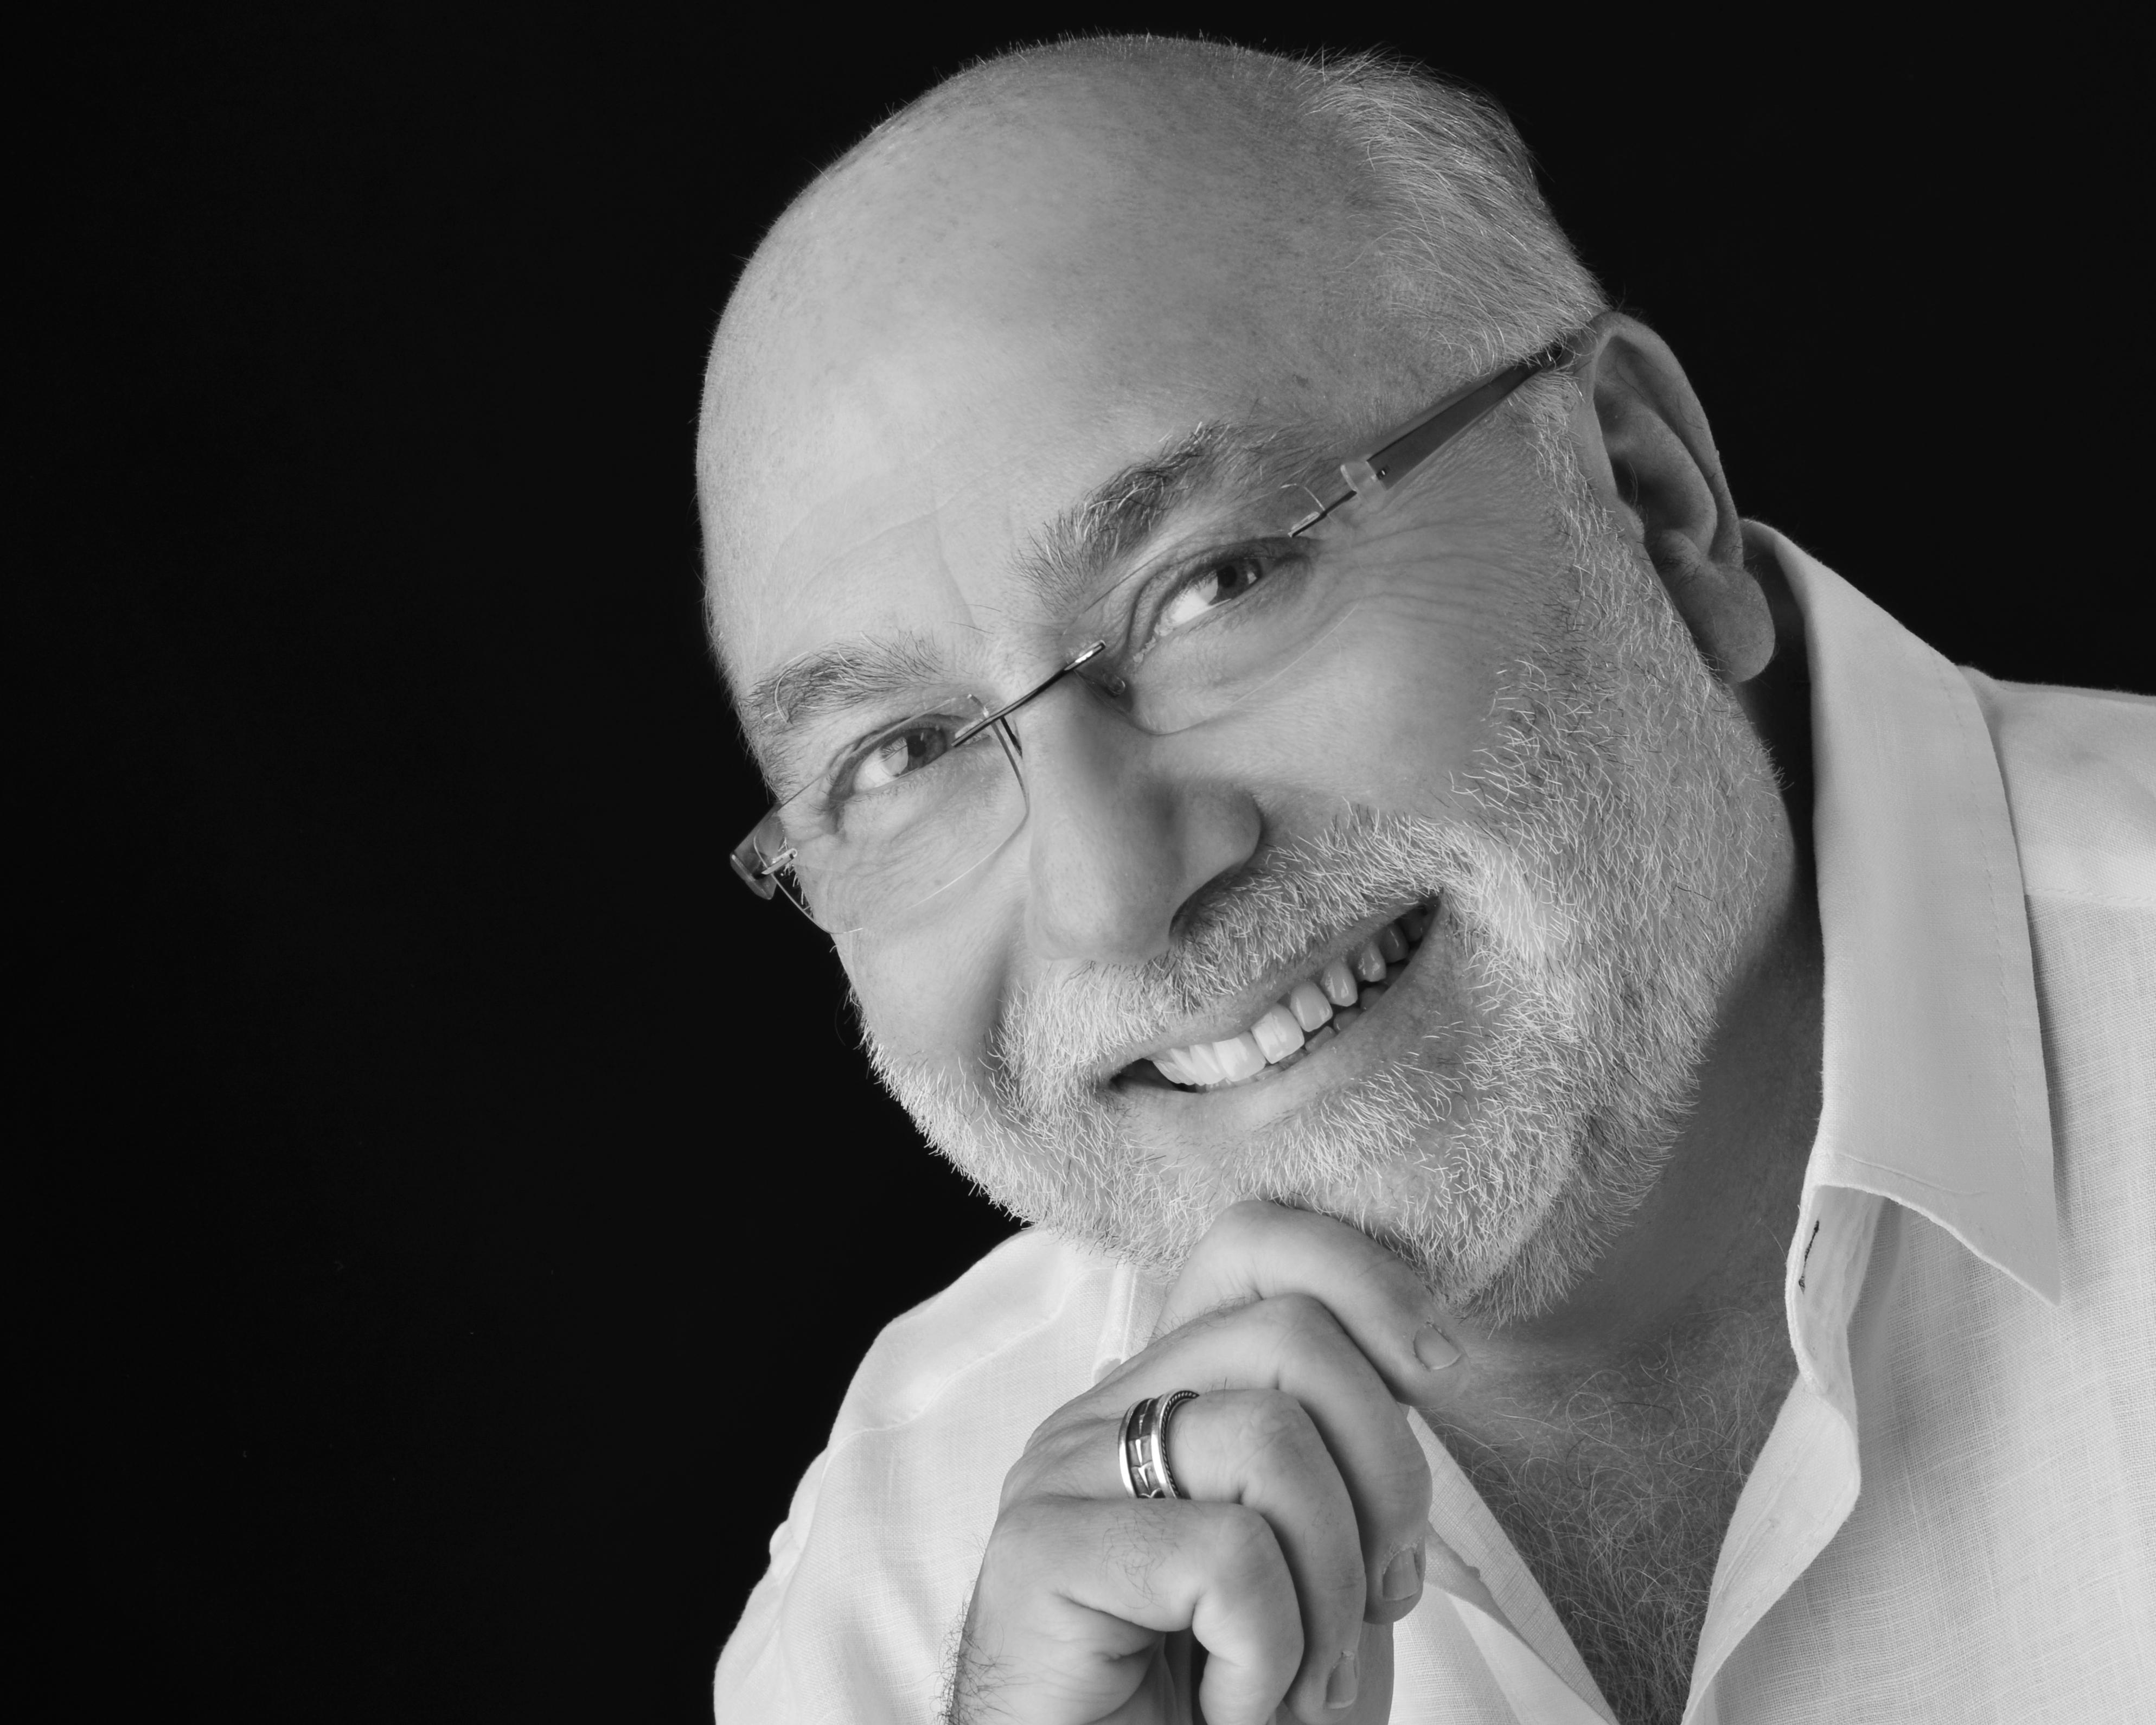 Michael Pizzi